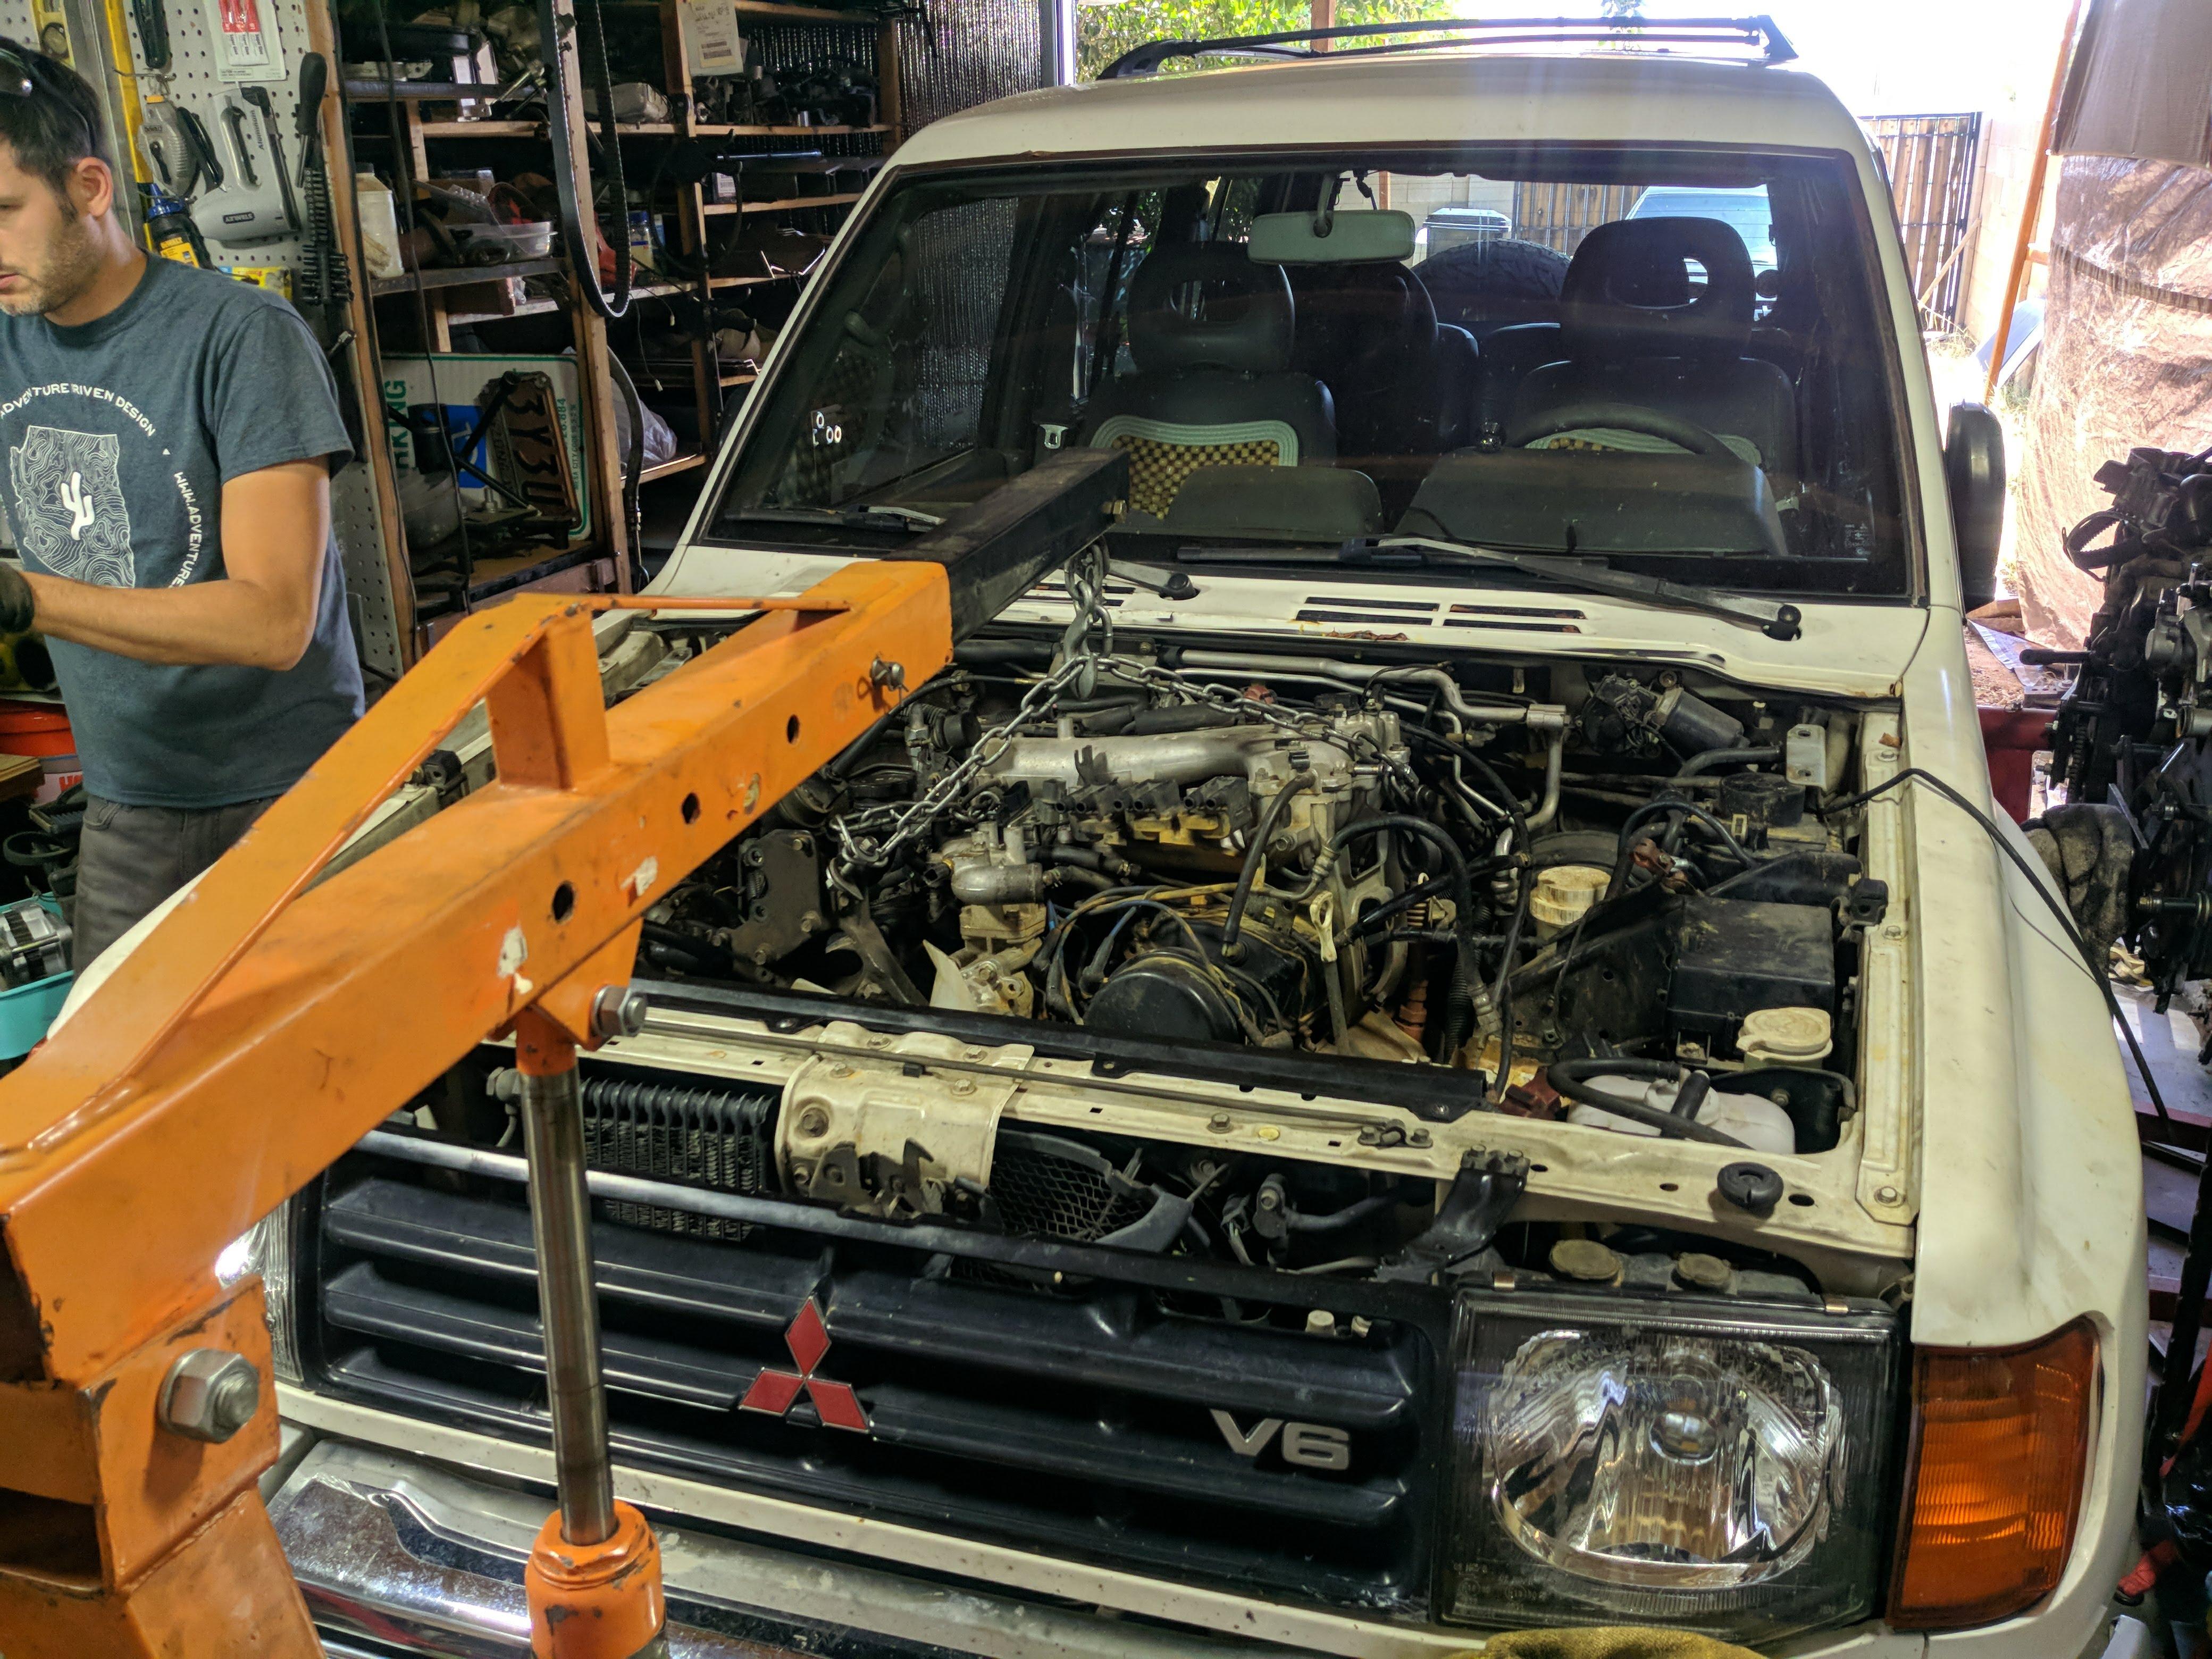 Engine hooked up